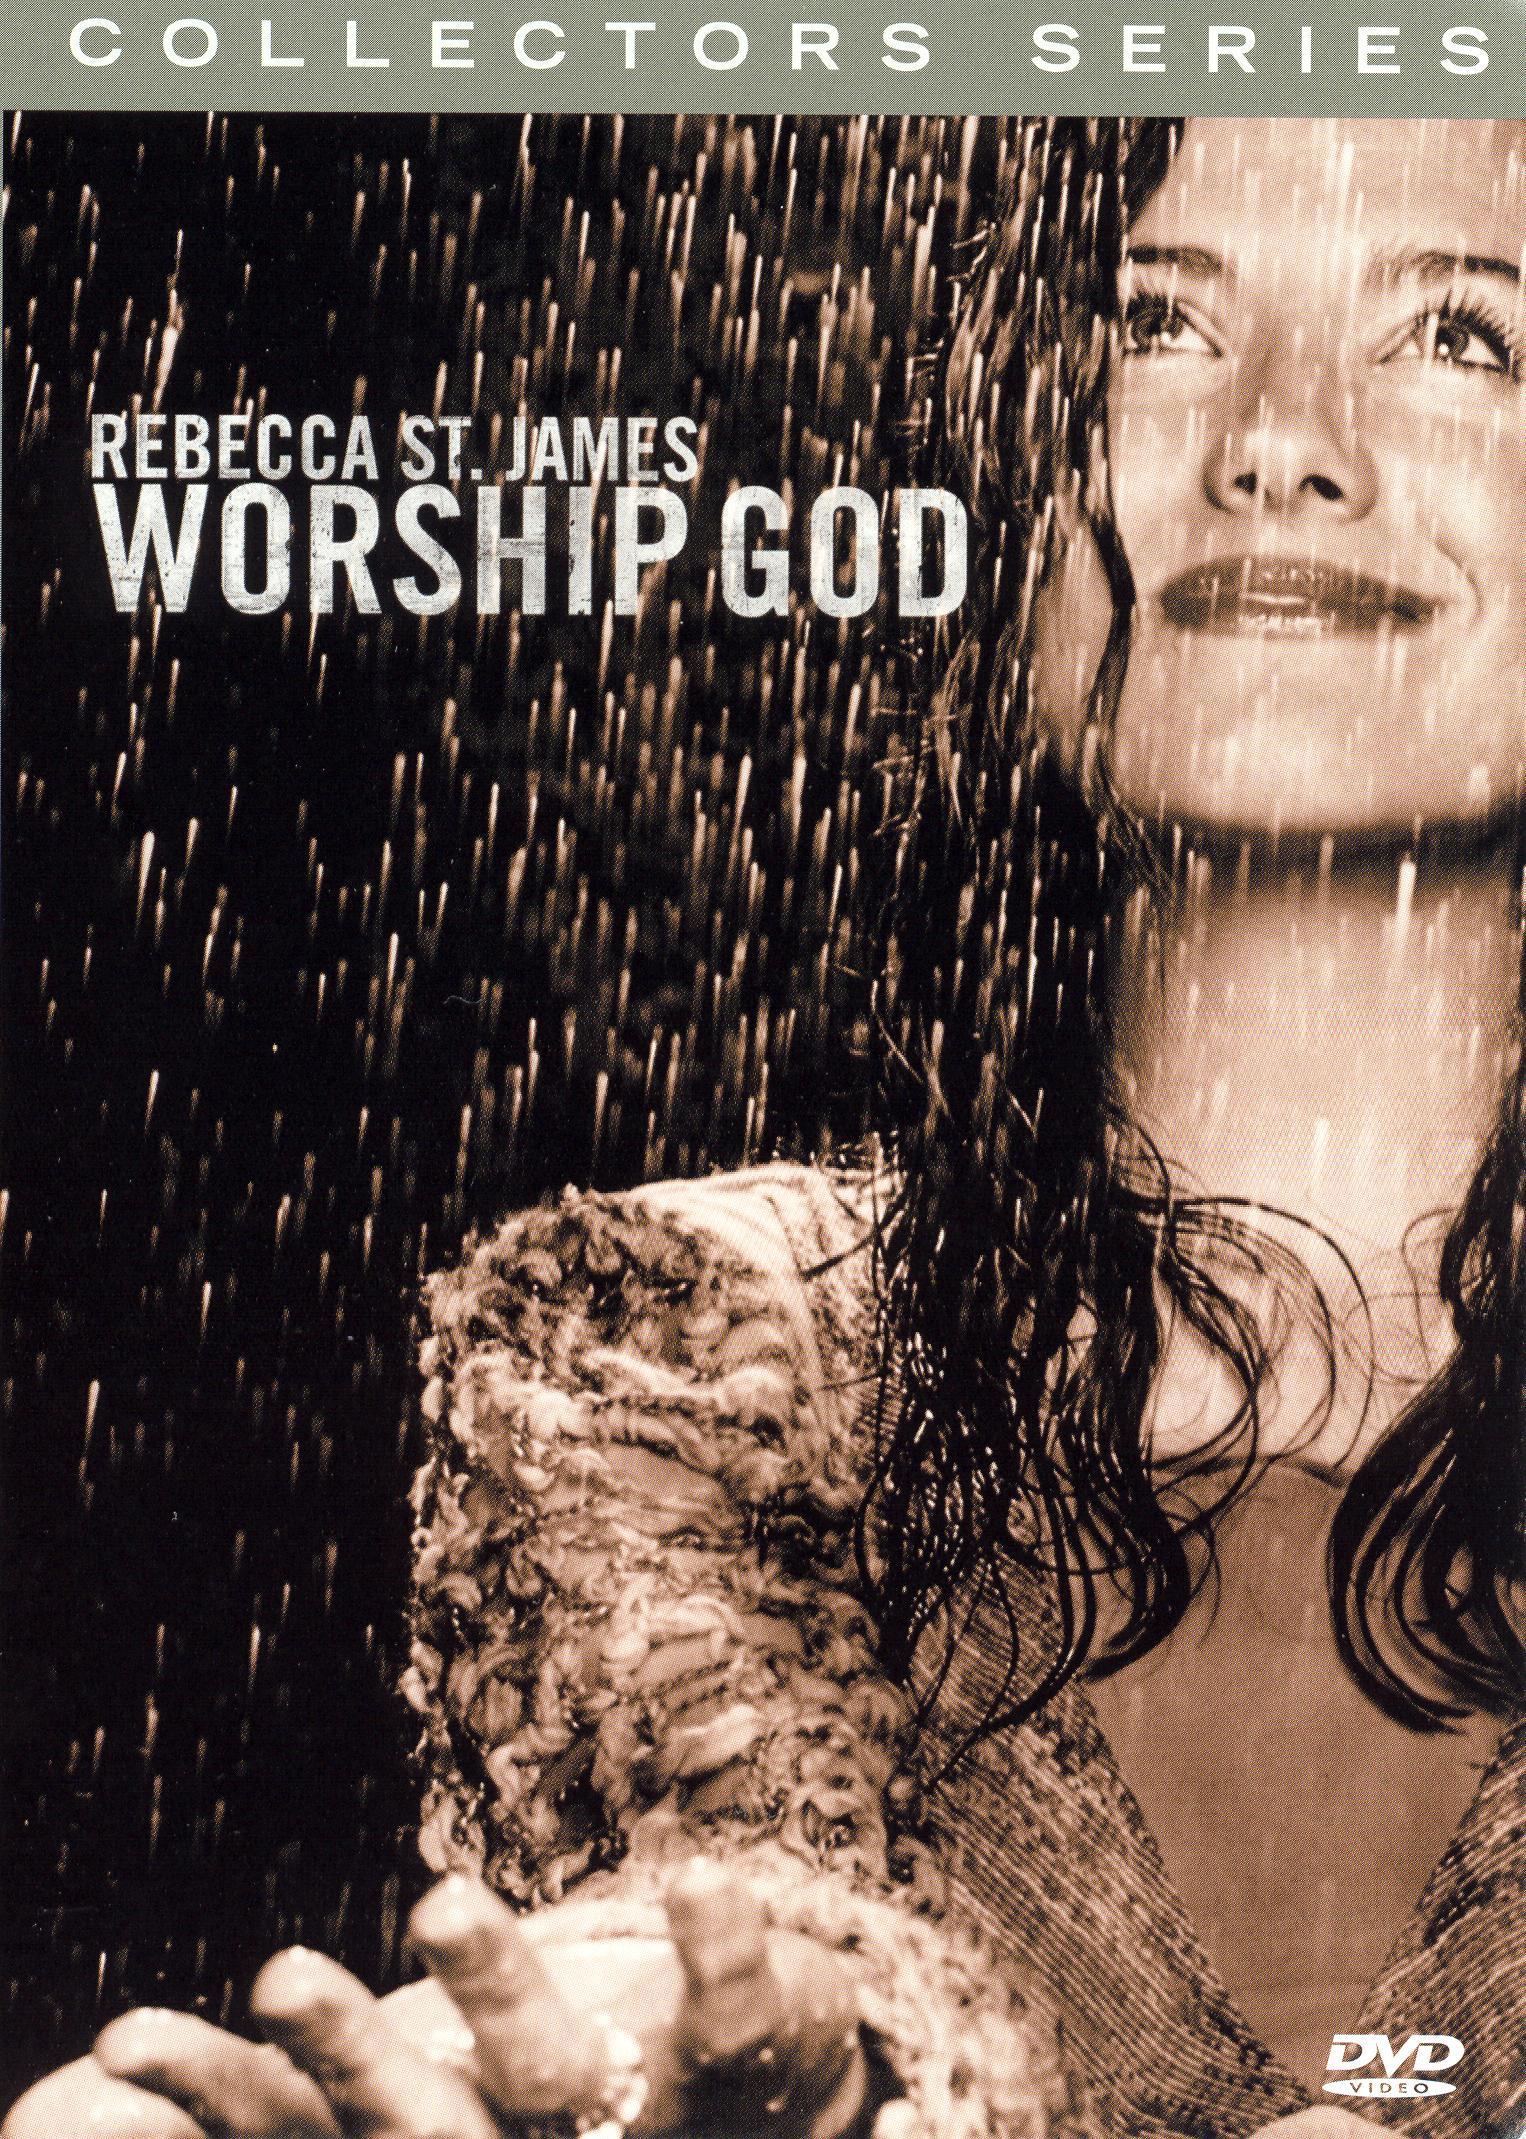 Collectors Series: Rebecca St. James - Worship God